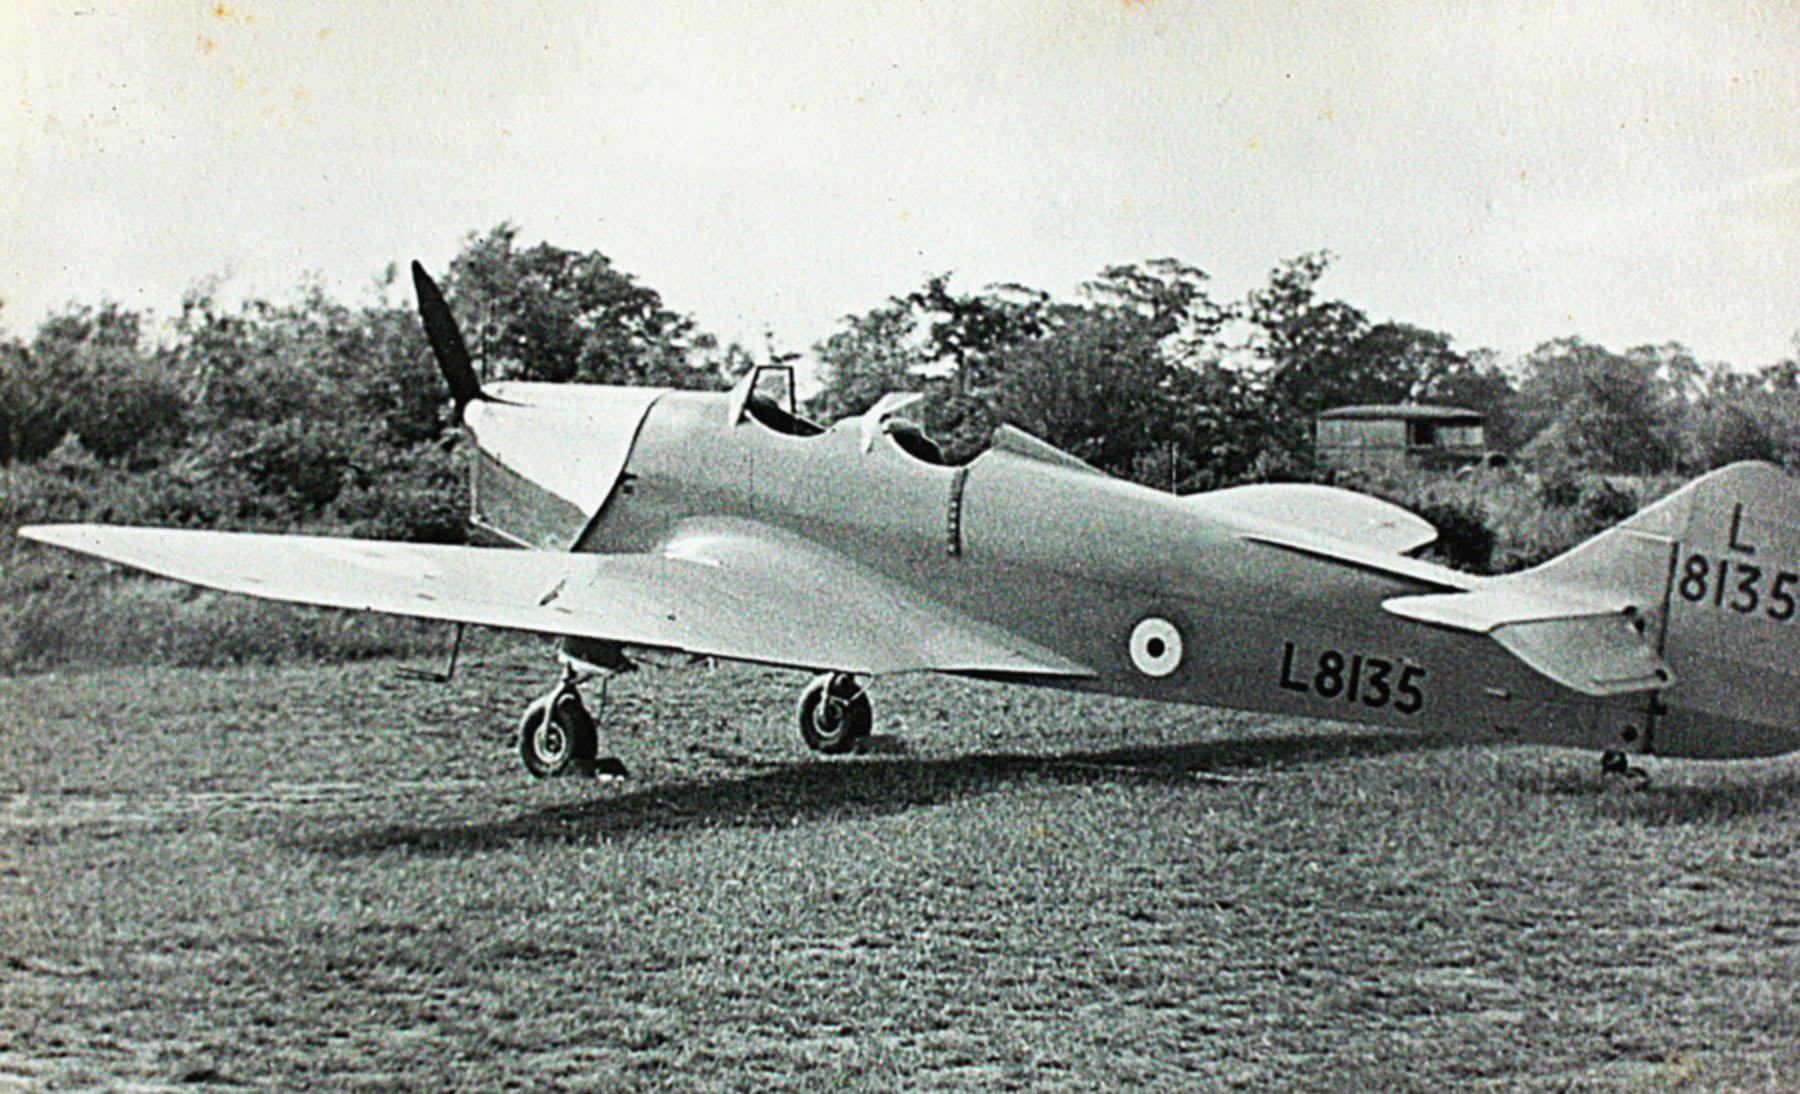 Mills Magister RAF L8135 trainer photo taken by Patrick Hayes KIA July 7 1940 01